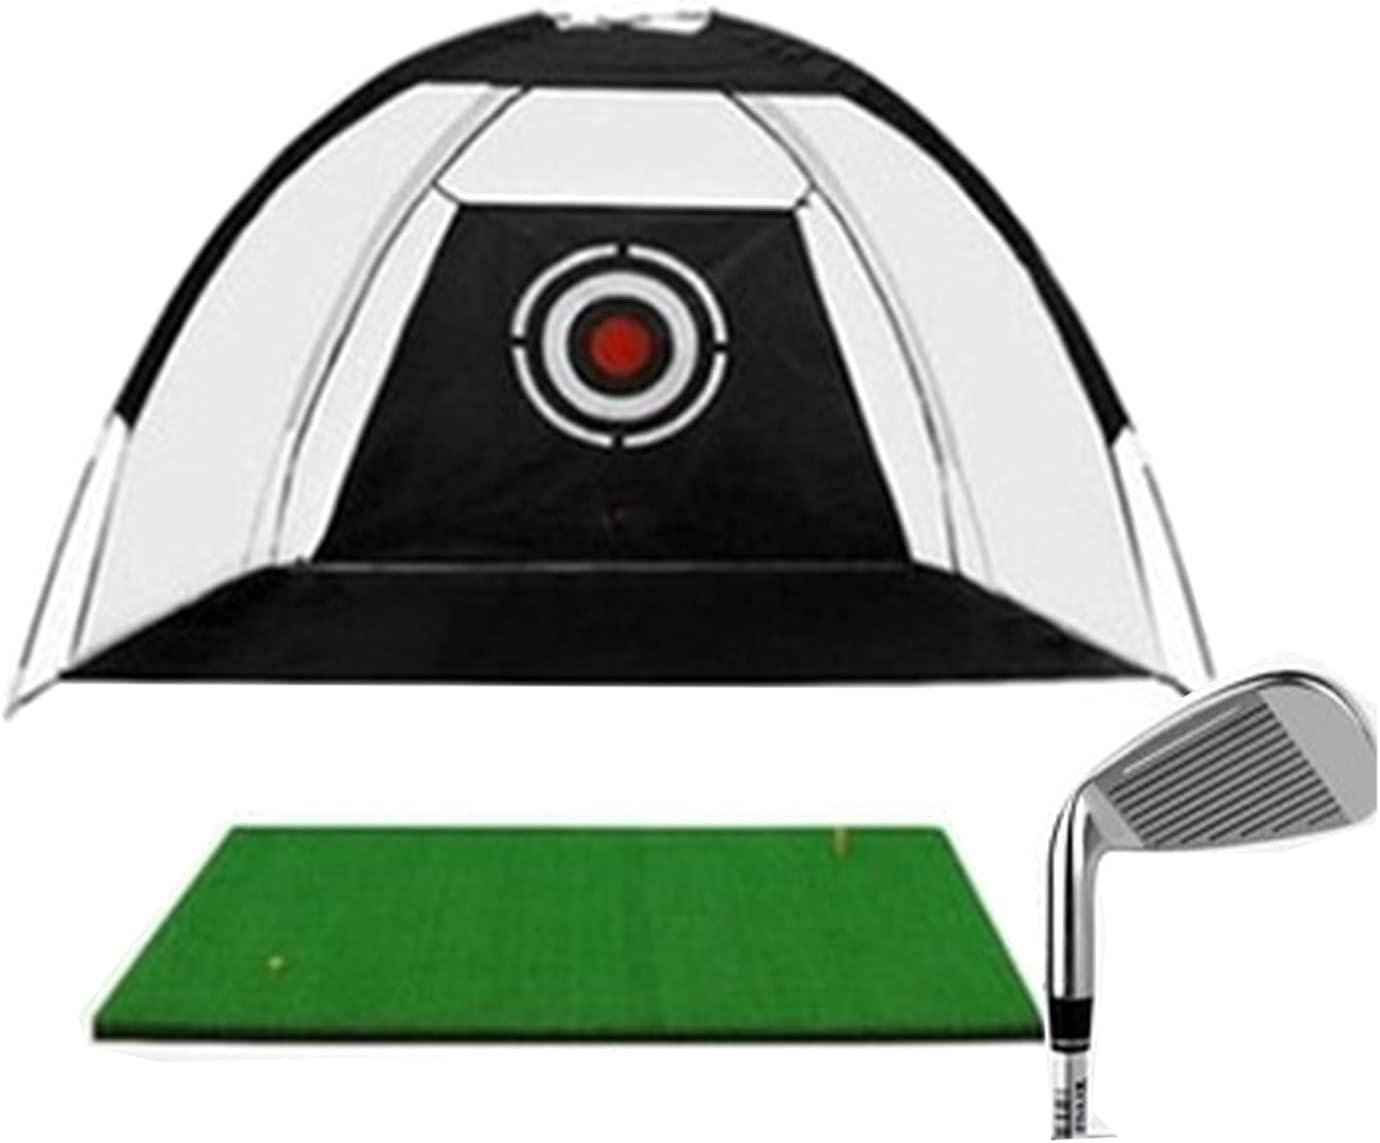 WANGJL Golf Practice Net Backyard Long Beach Mall Bat Outdoor and Indoor Driving Daily bargain sale